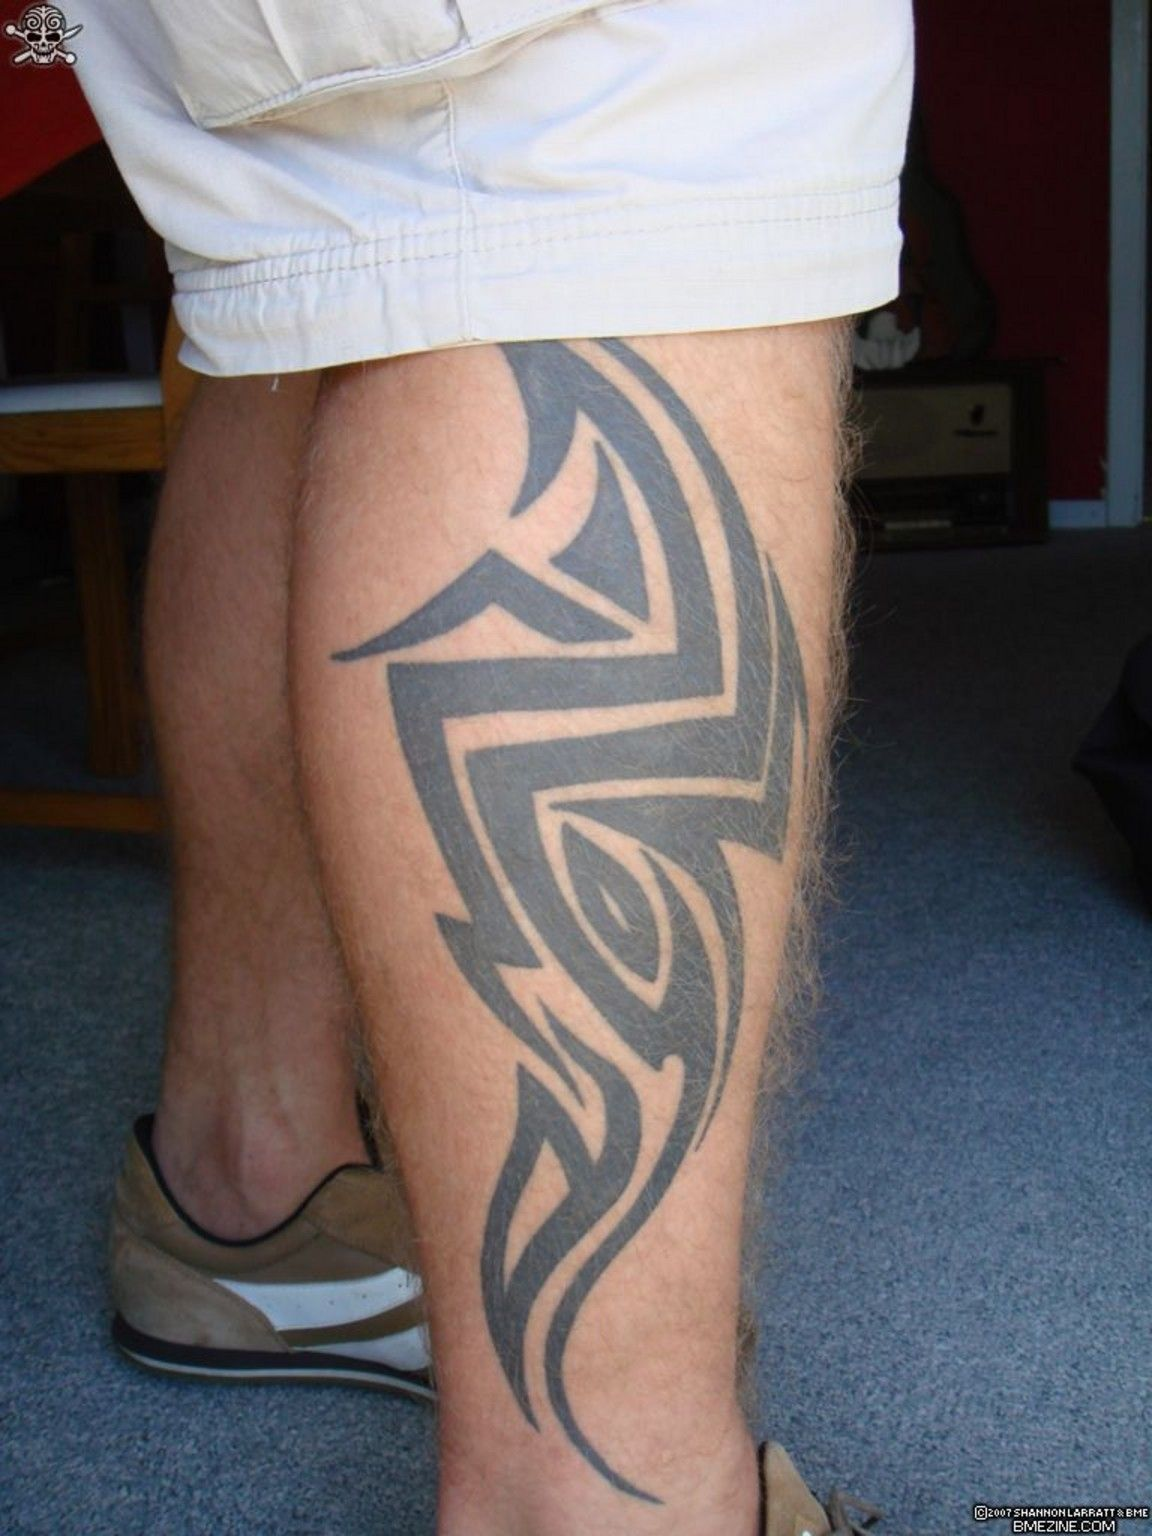 Tribal+Tattoo+Designs+Leg+For+Men Tribal tattoos, Leg